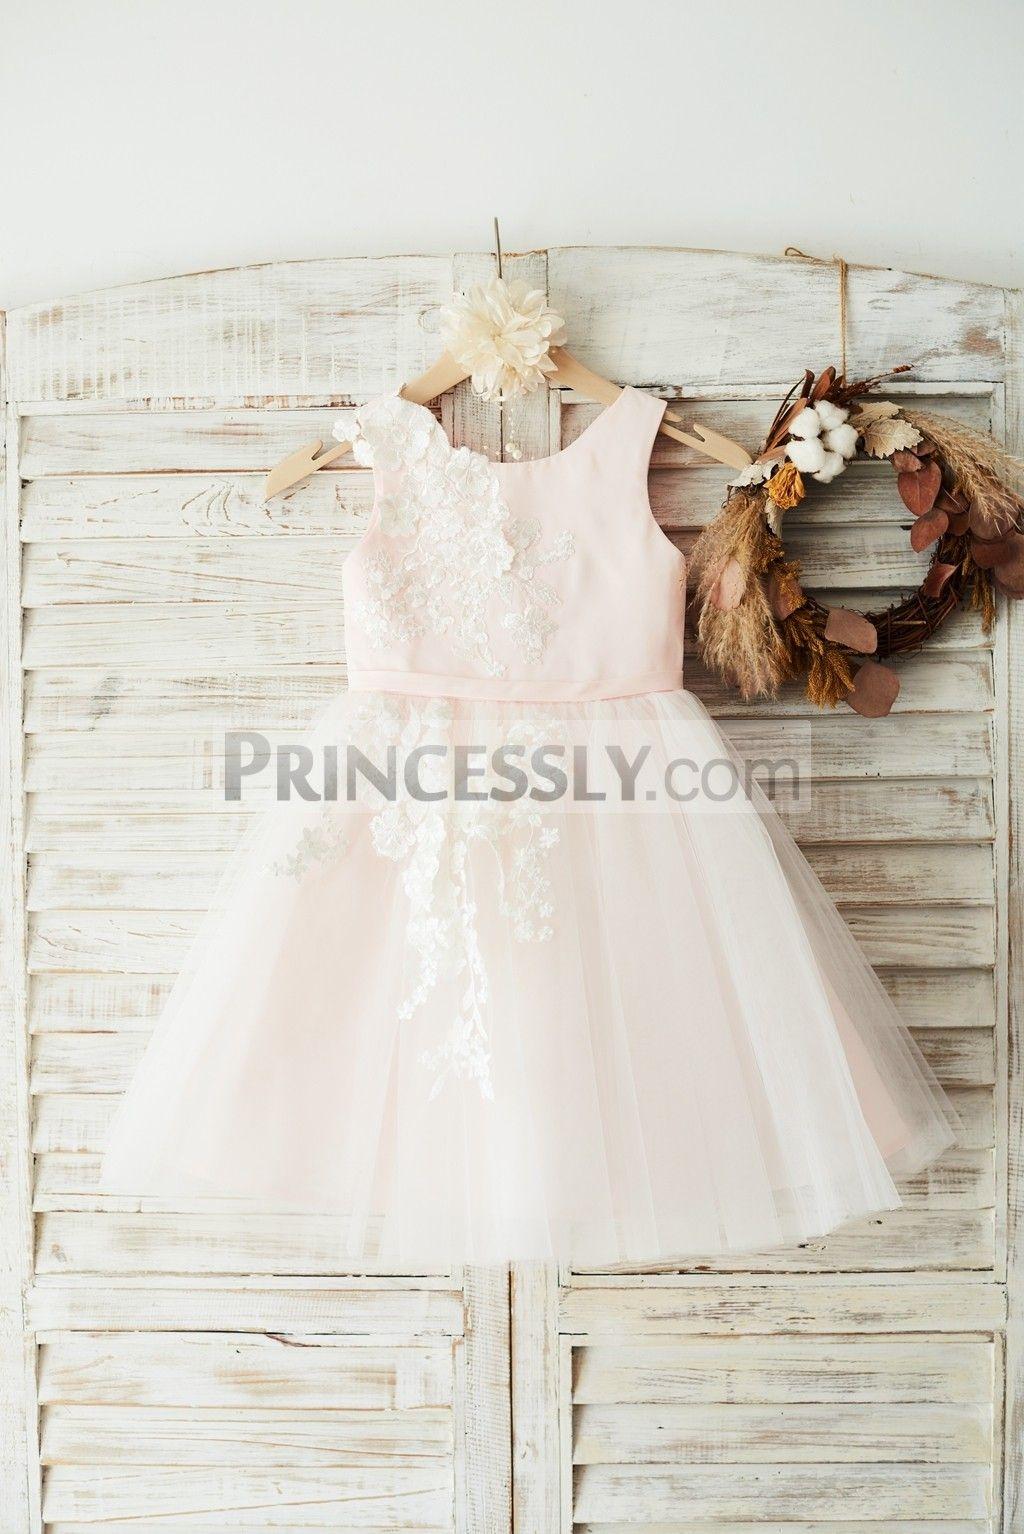 Girls wedding dress  Ivory Lace Tulle Pink Satin Wedding Flower Girl Dress Junior